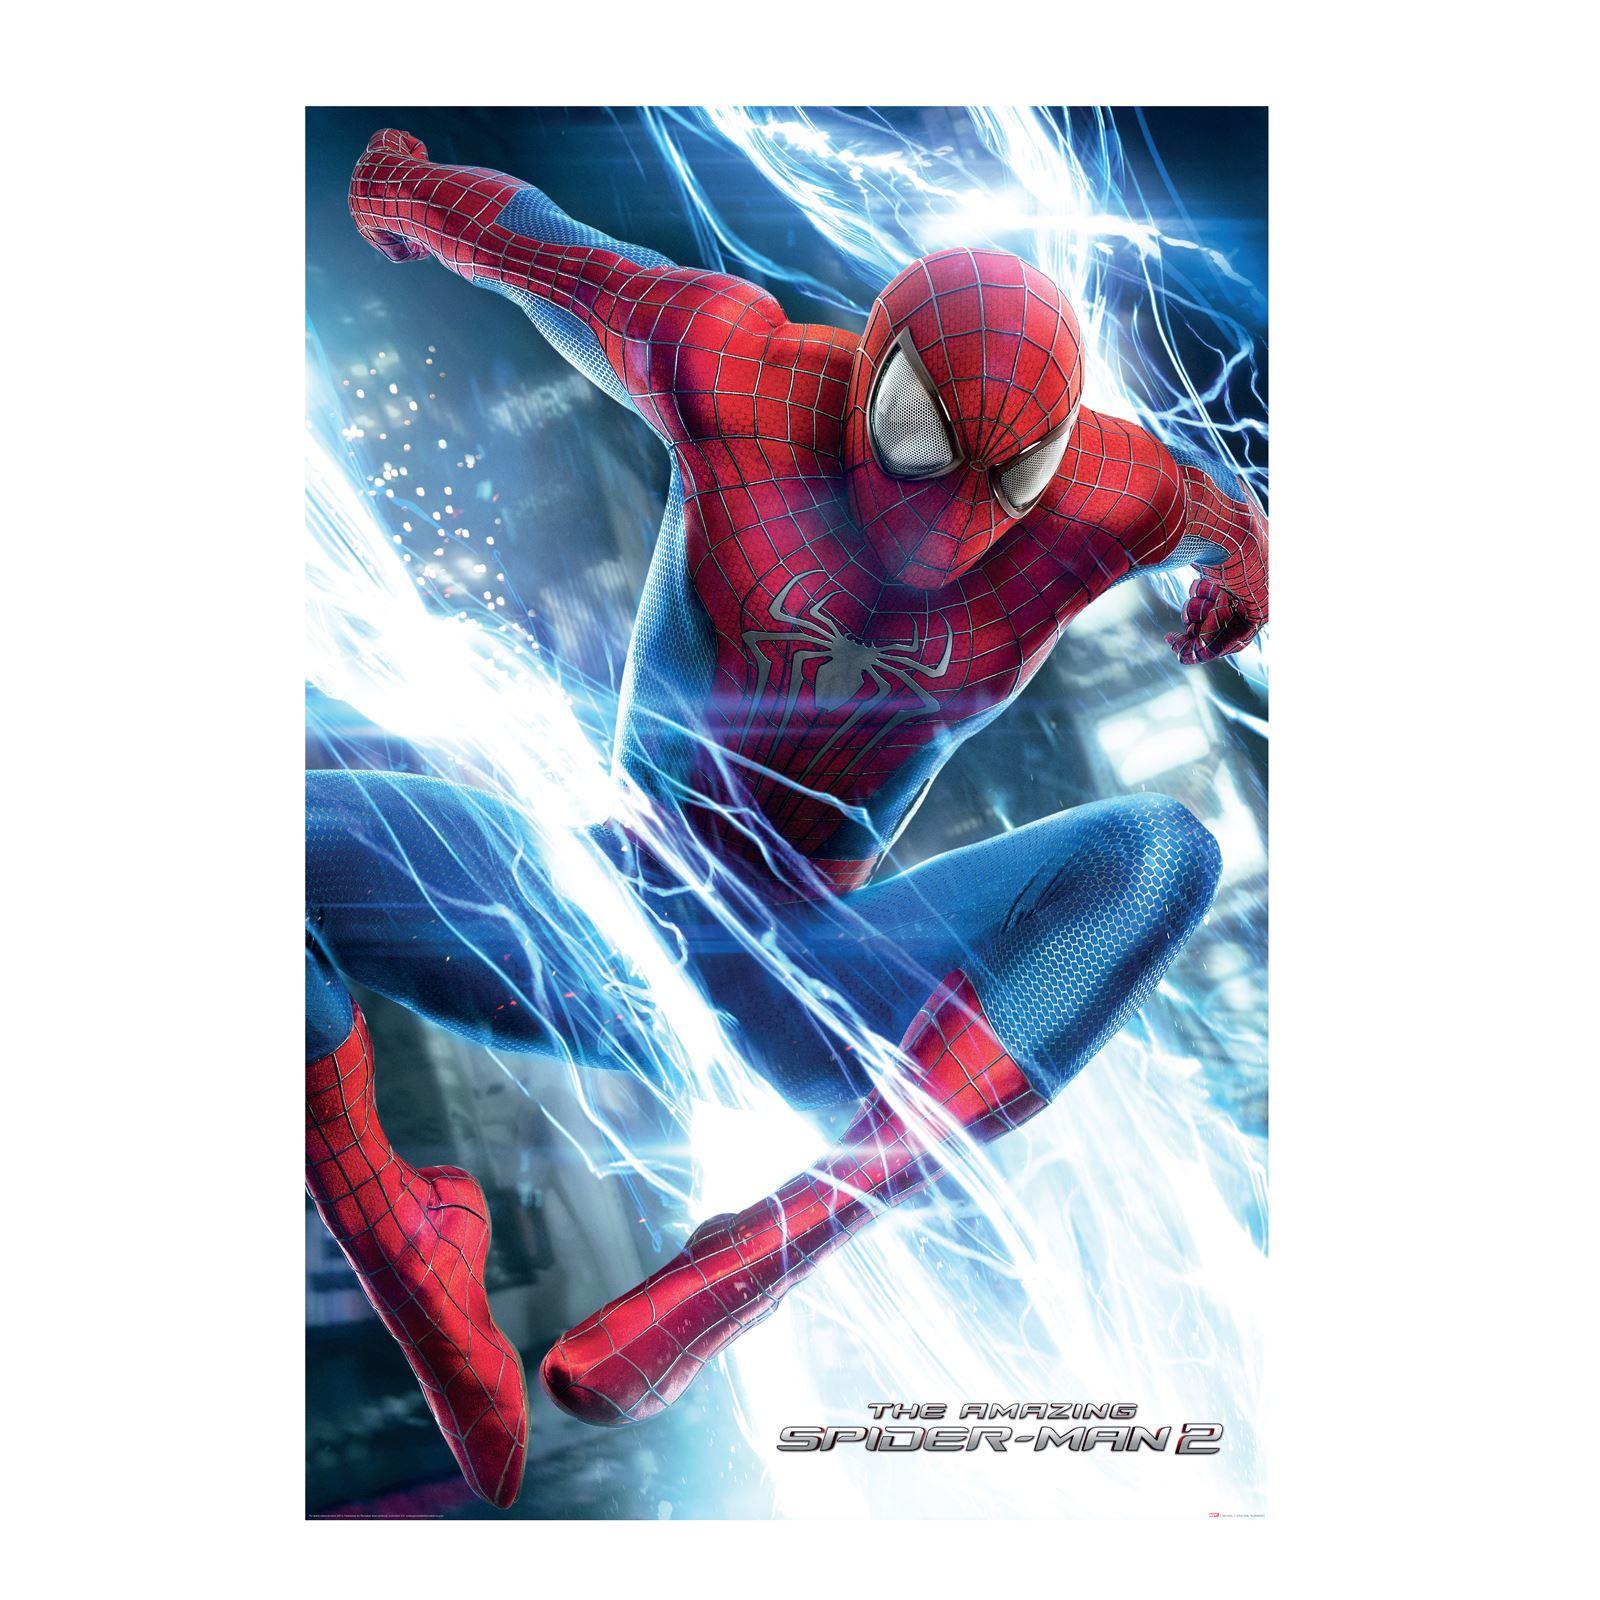 SPIDERMAN WALLPAPER WALL MURAL 232cm x 158cm NEW SPIDER MAN FEATURE 1600x1600